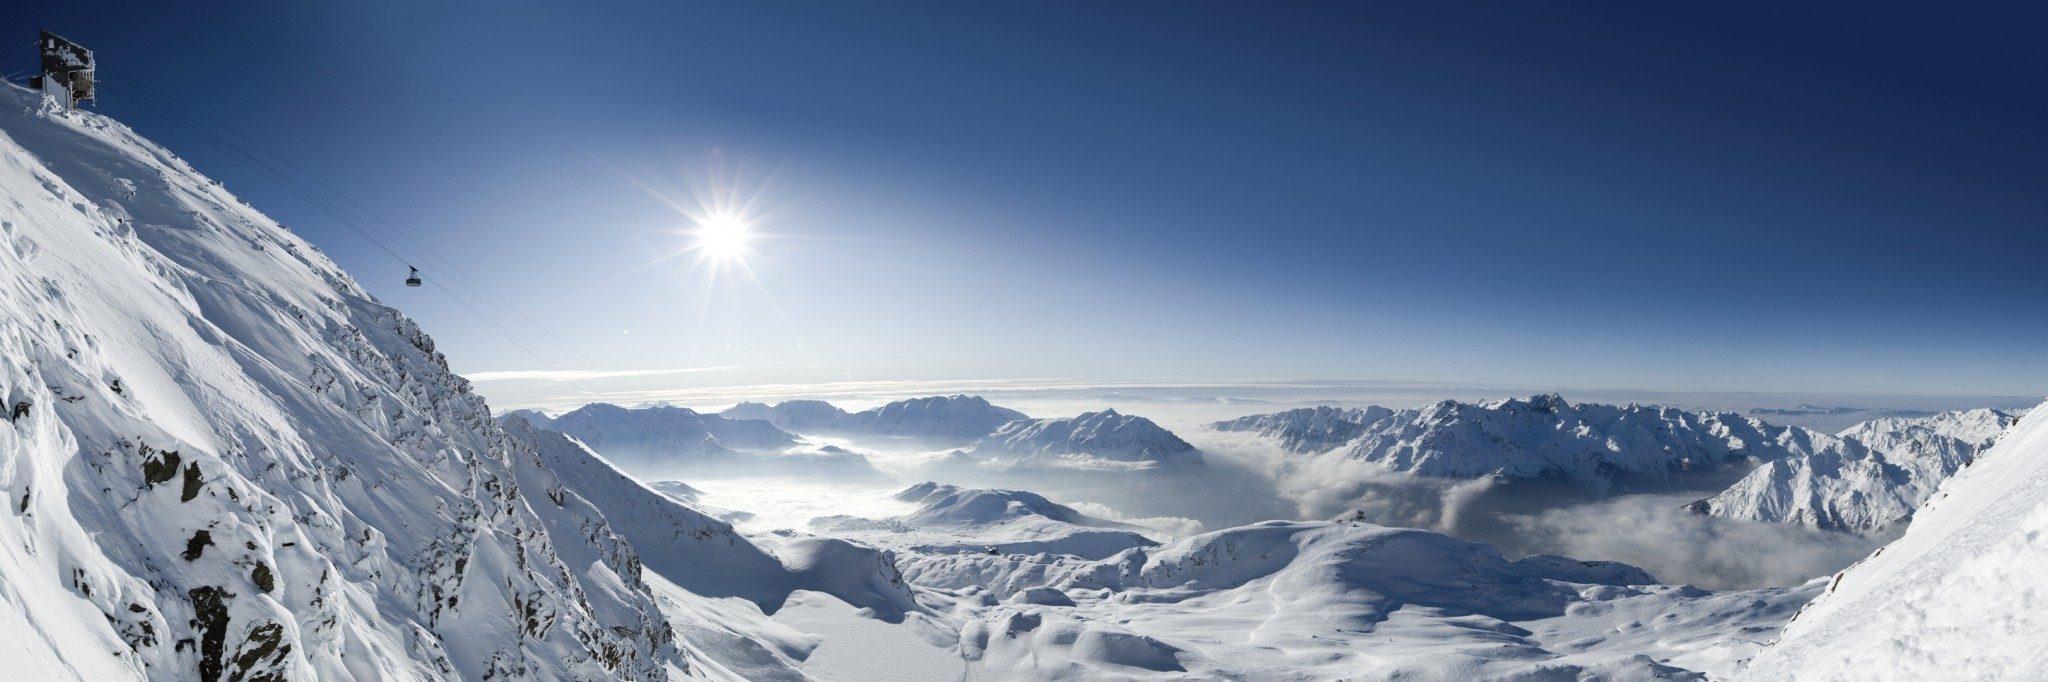 Credit : L. Salino - Alpe d'Huez Tourisme